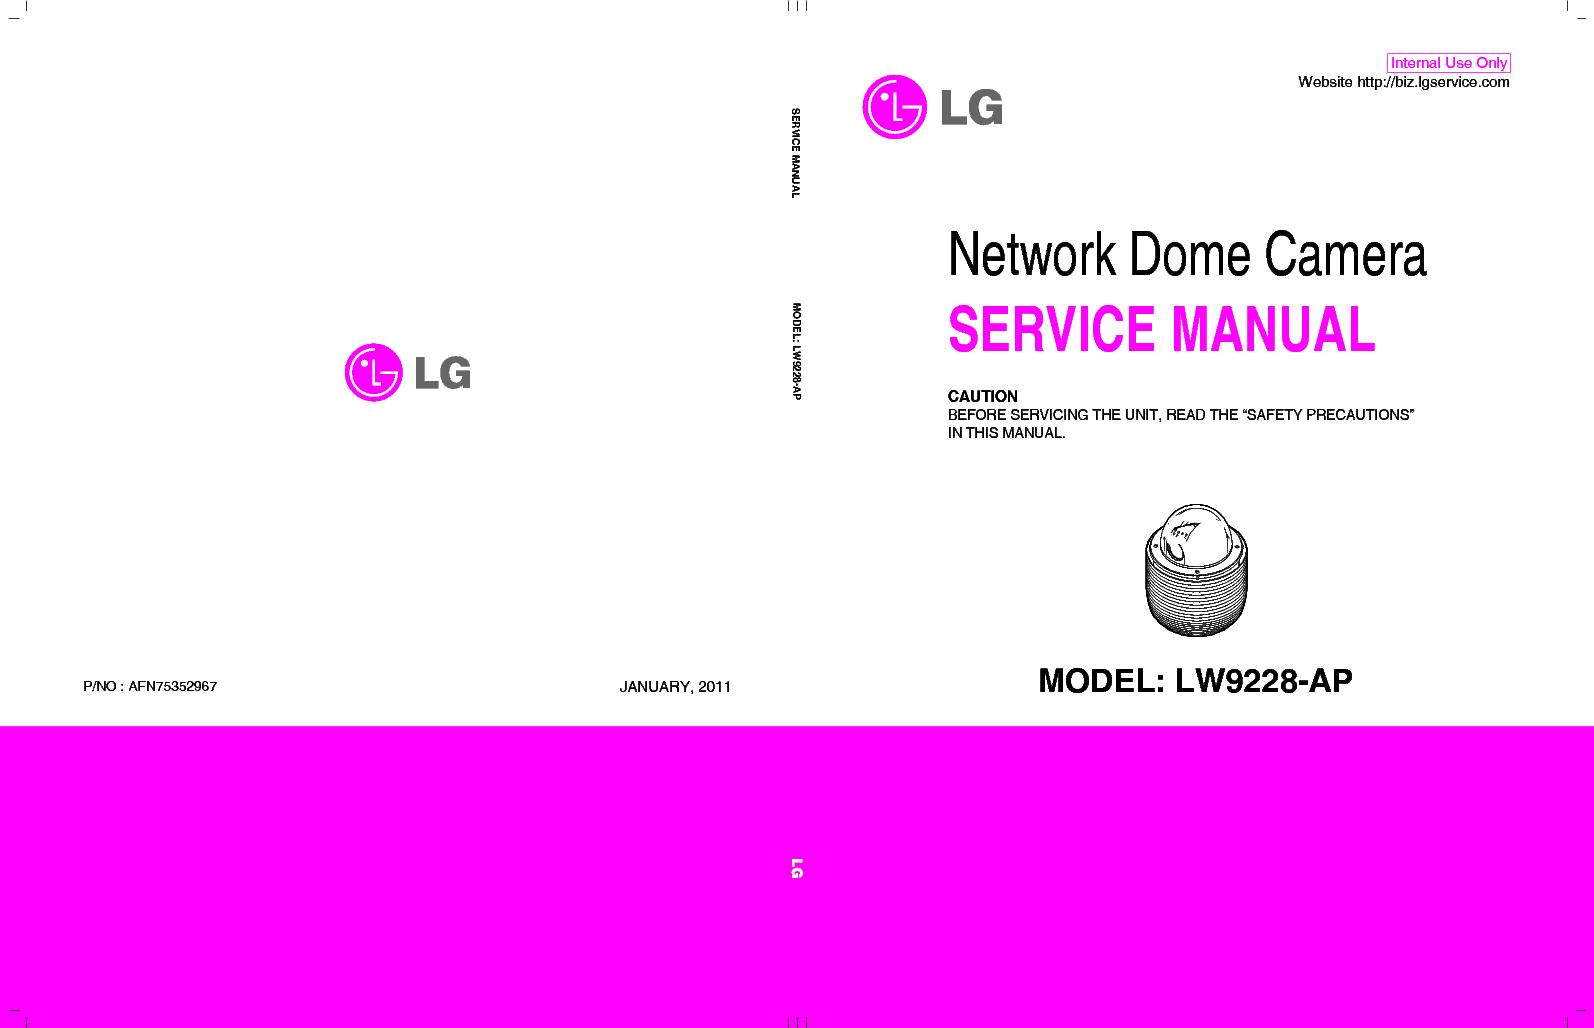 LG LW9228-AP AFN75352967 service manual (1st page)